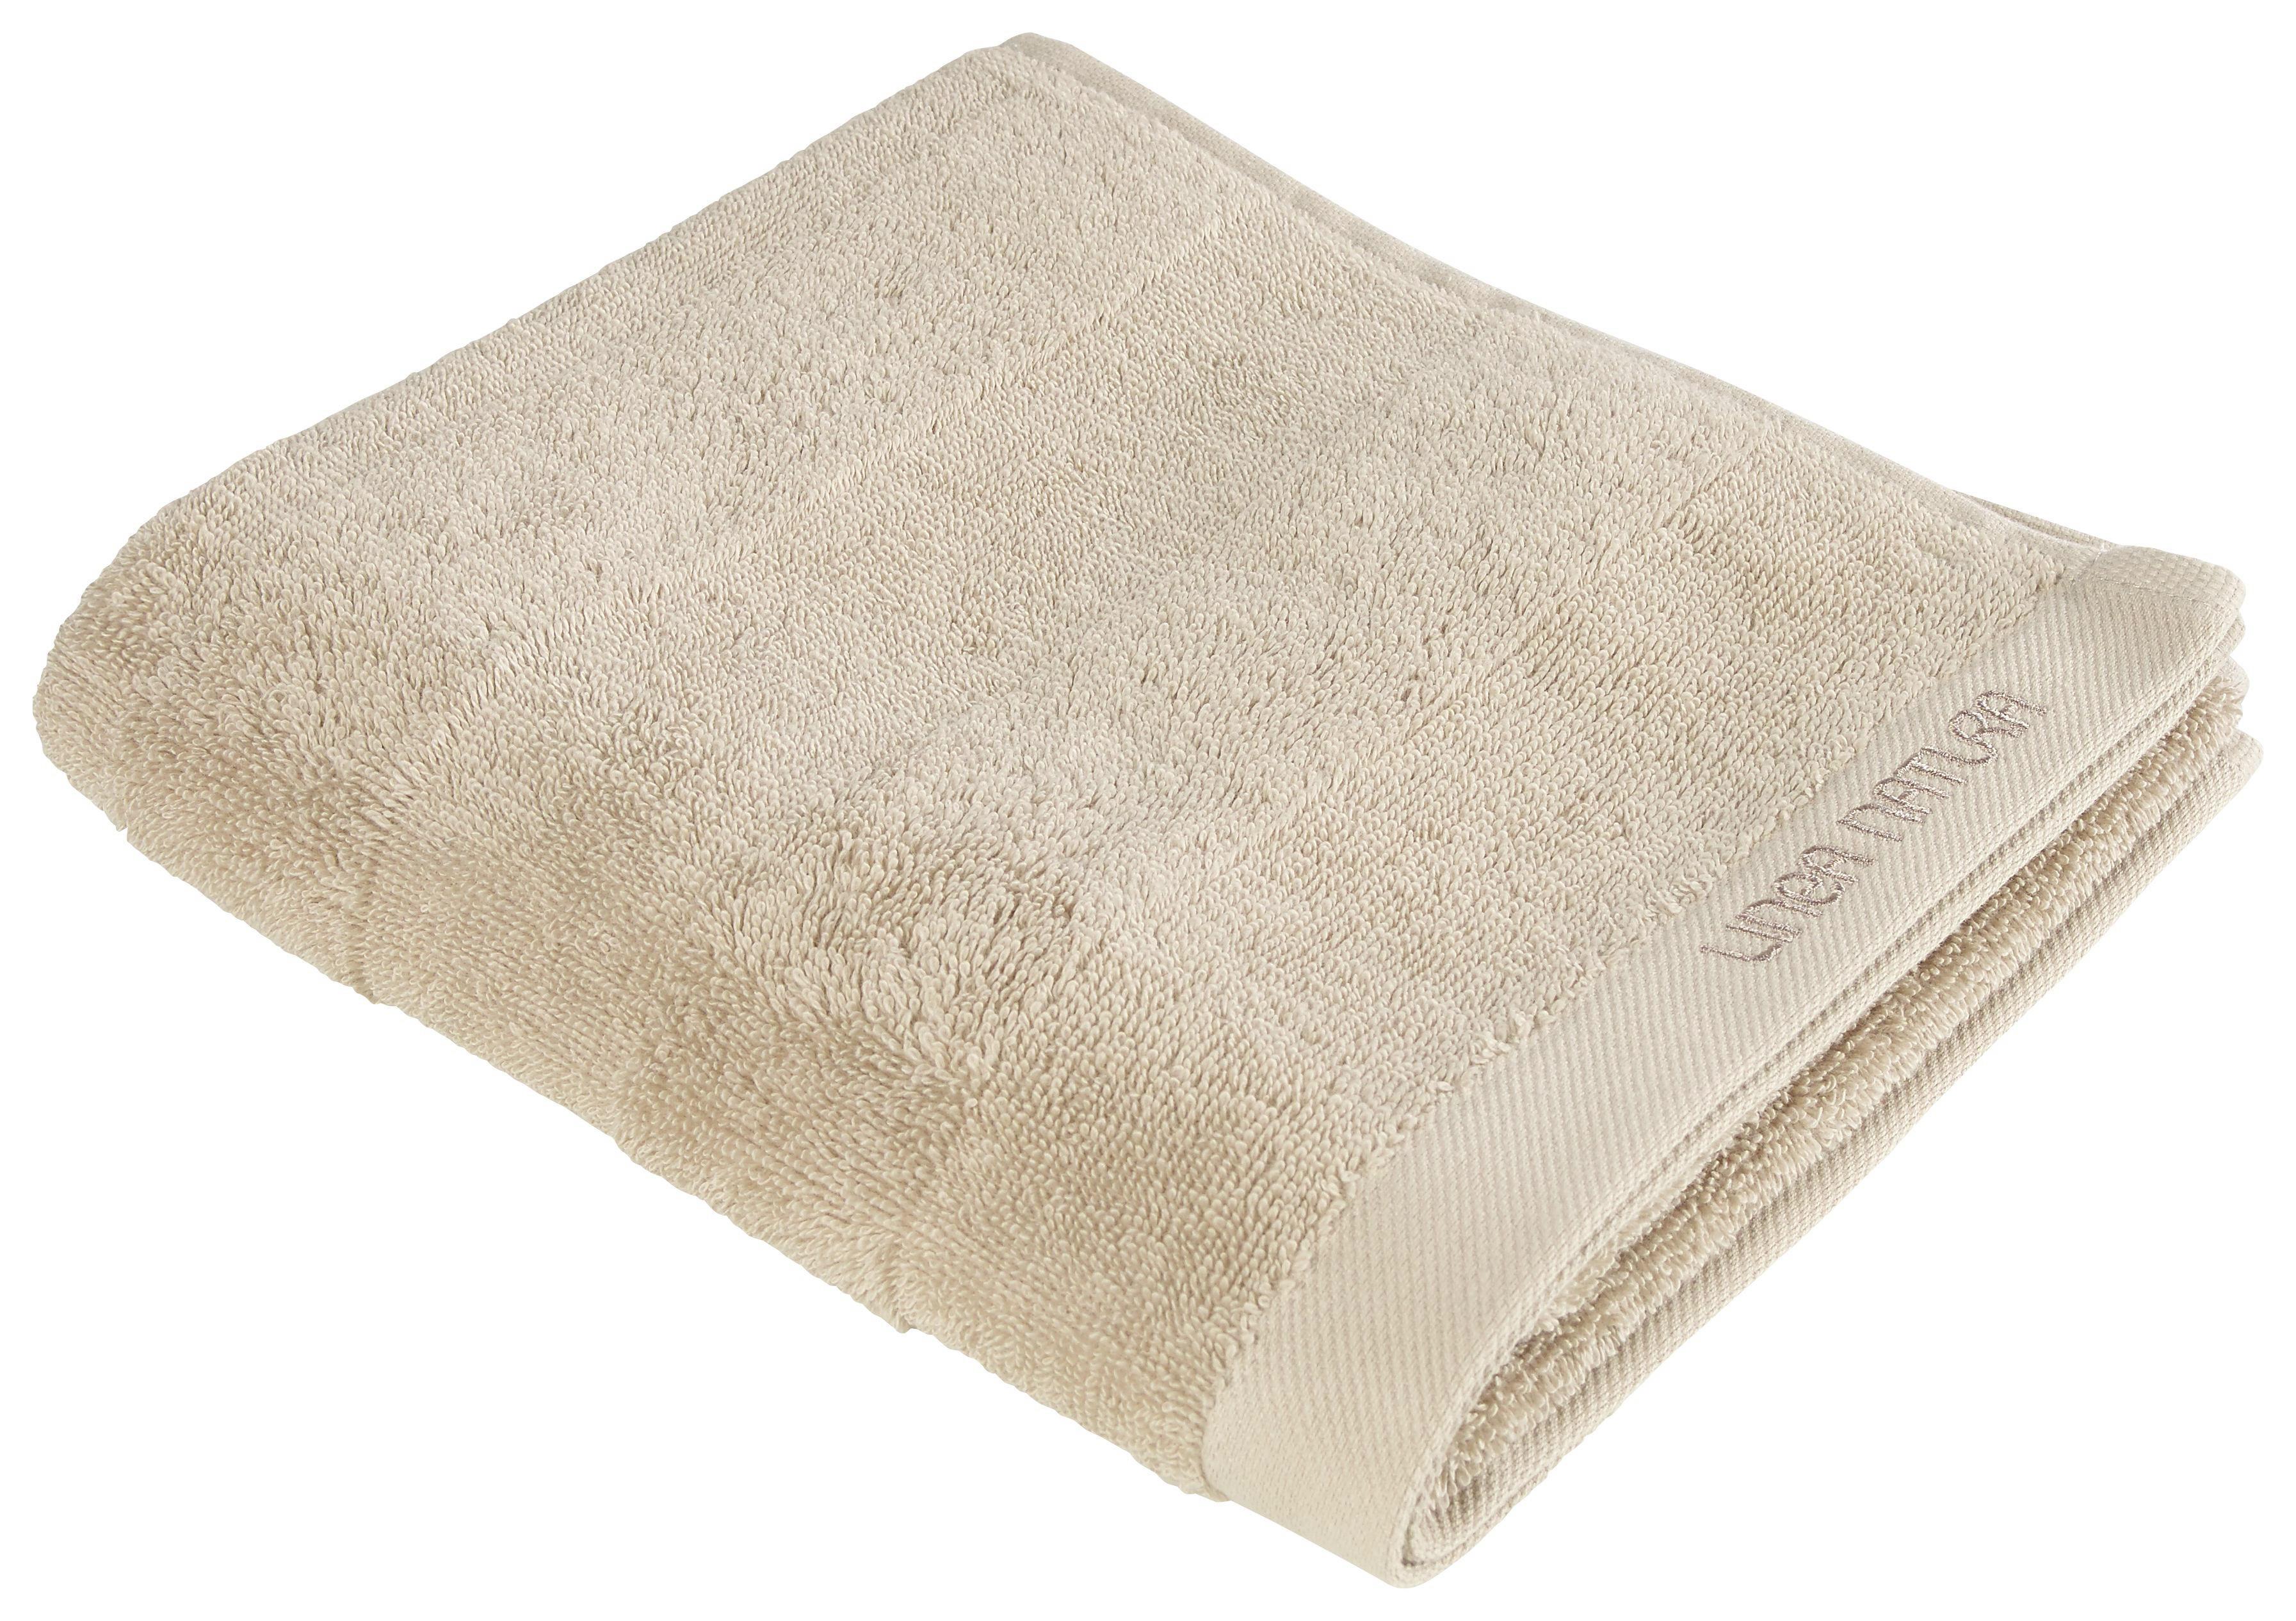 HANDTUCH 50/100 cm - Beige, Basics, Textil (50/100cm) - LINEA NATURA